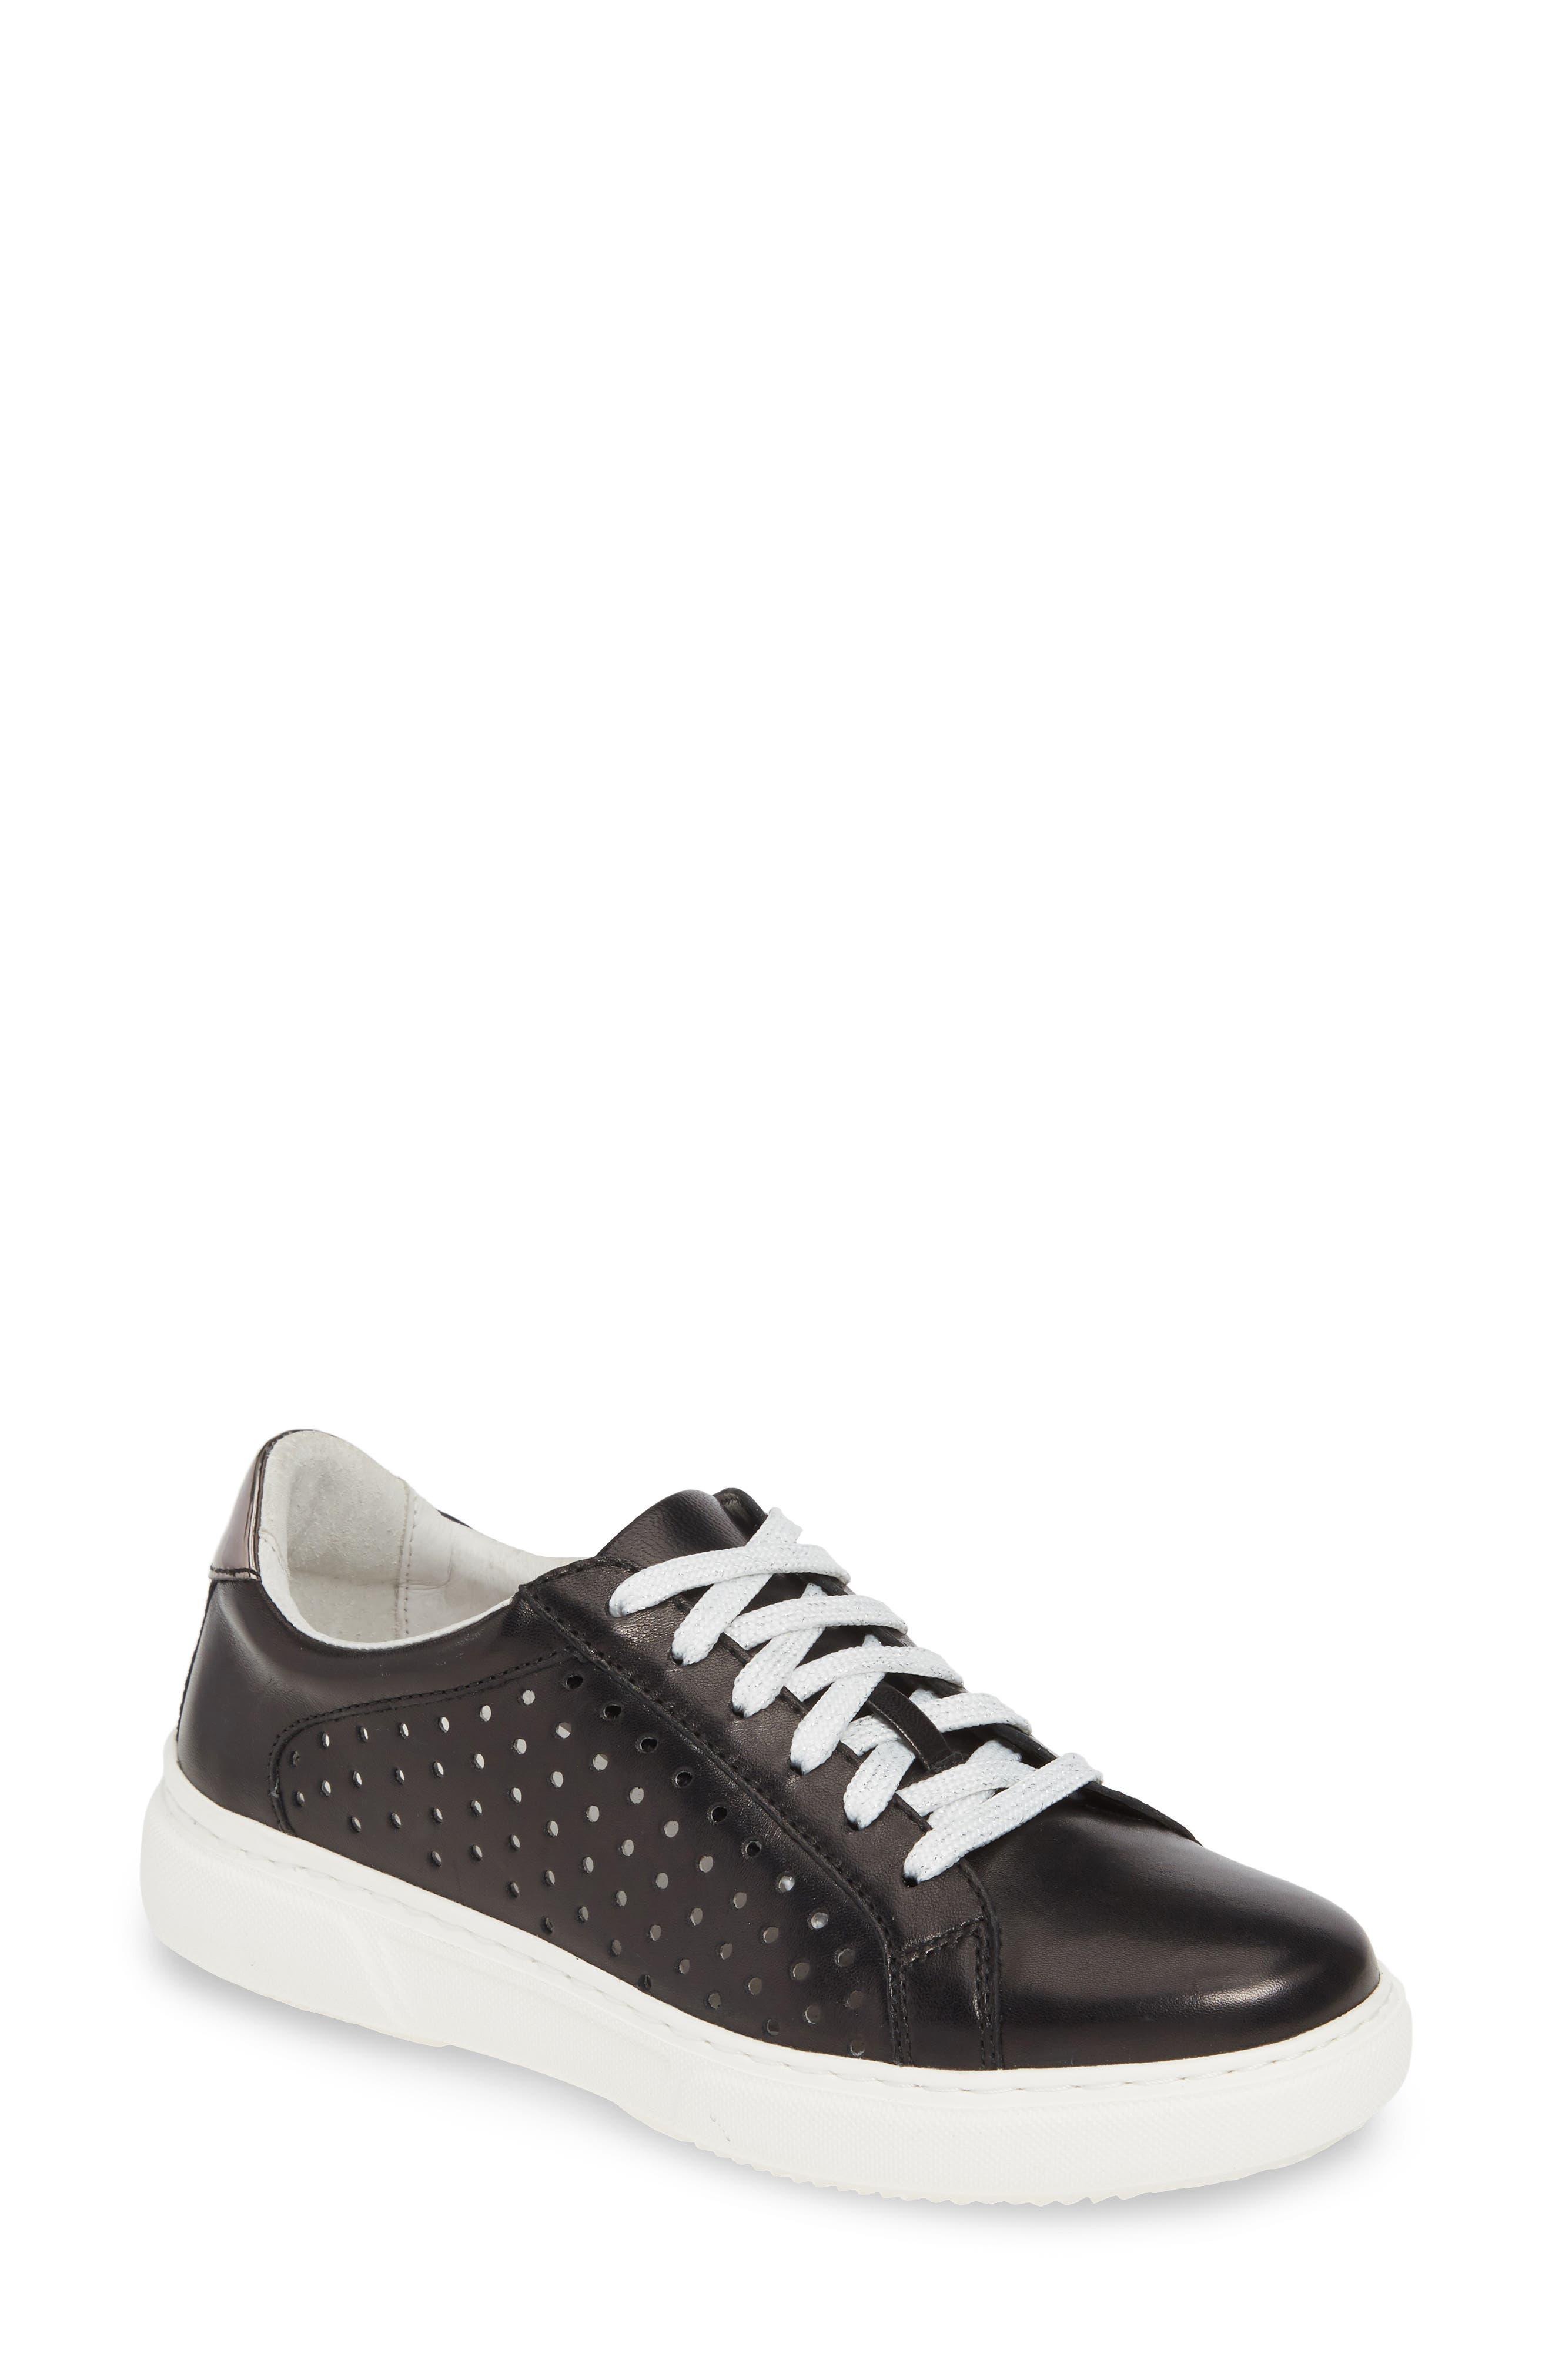 Johnston & Murphy Nora Perforated Sneaker, Black